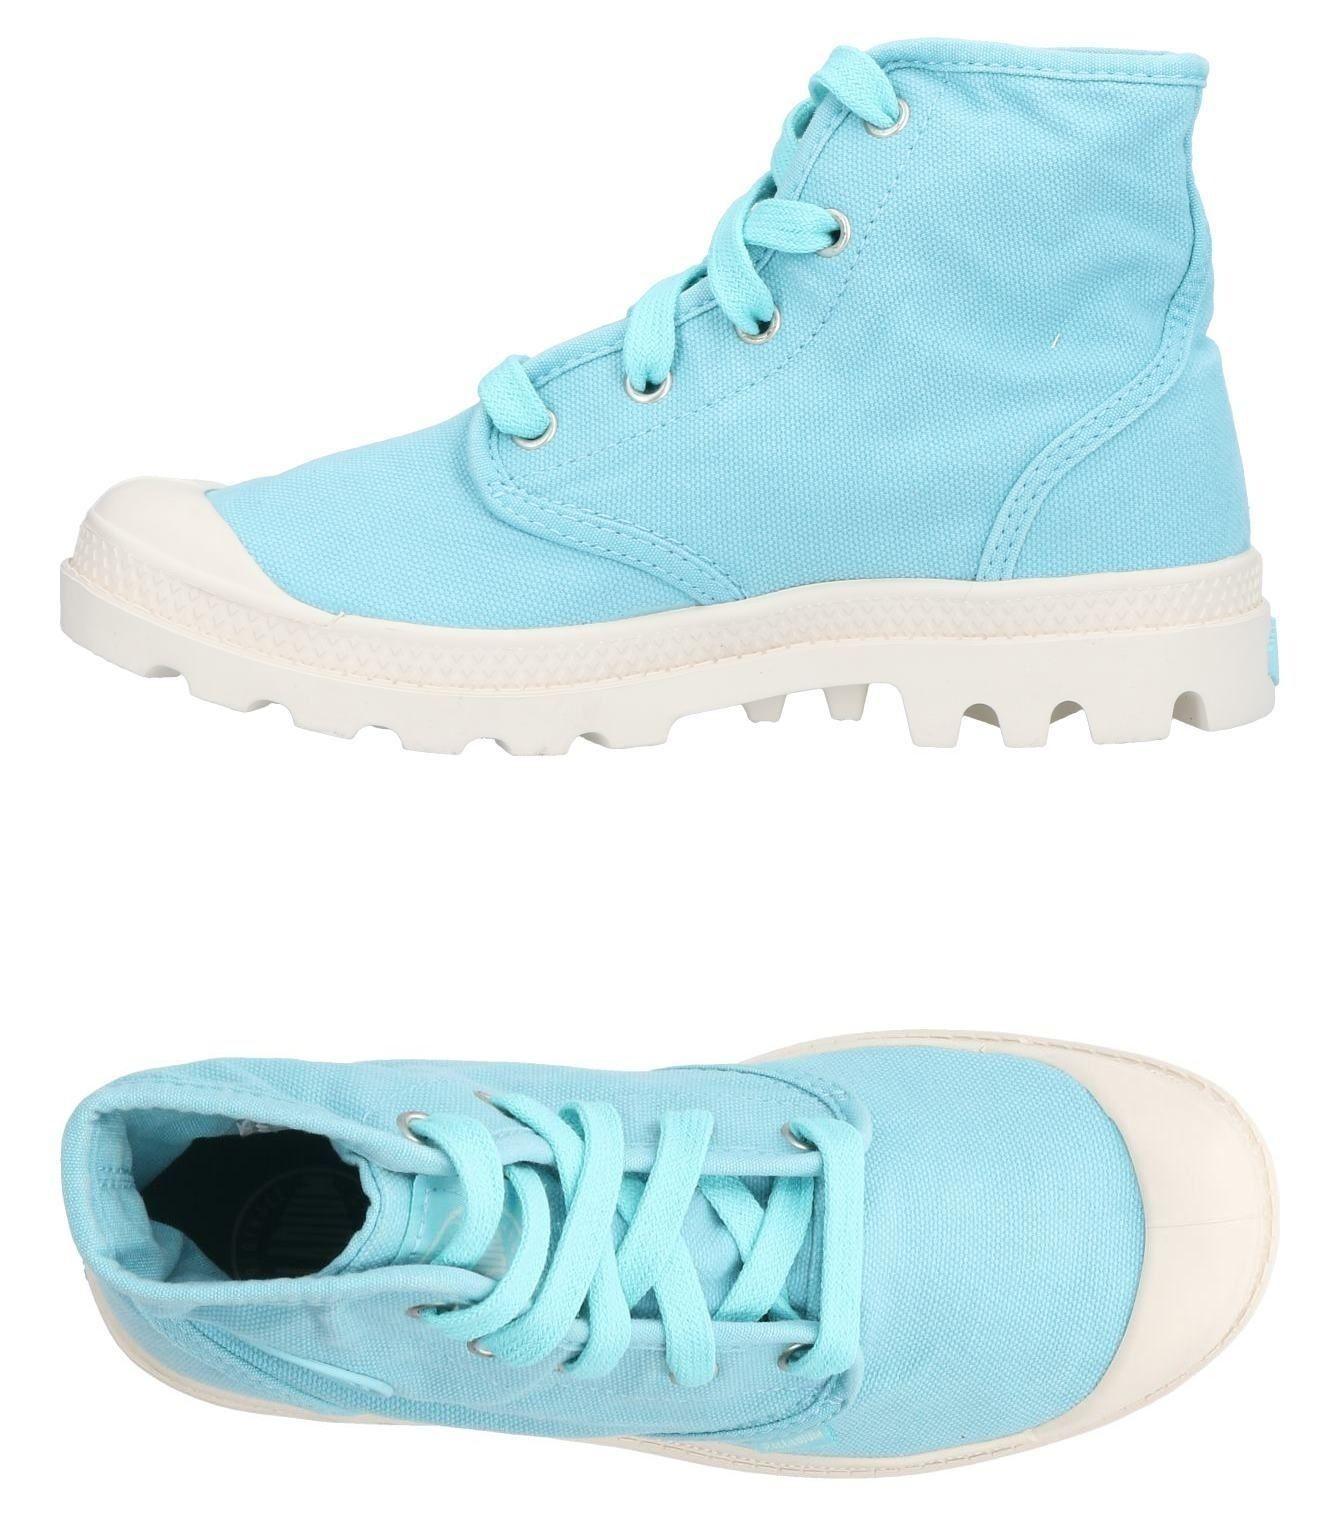 184f70af8338 PALLADIUM Sneakers Sky Blue Botas De Paladio